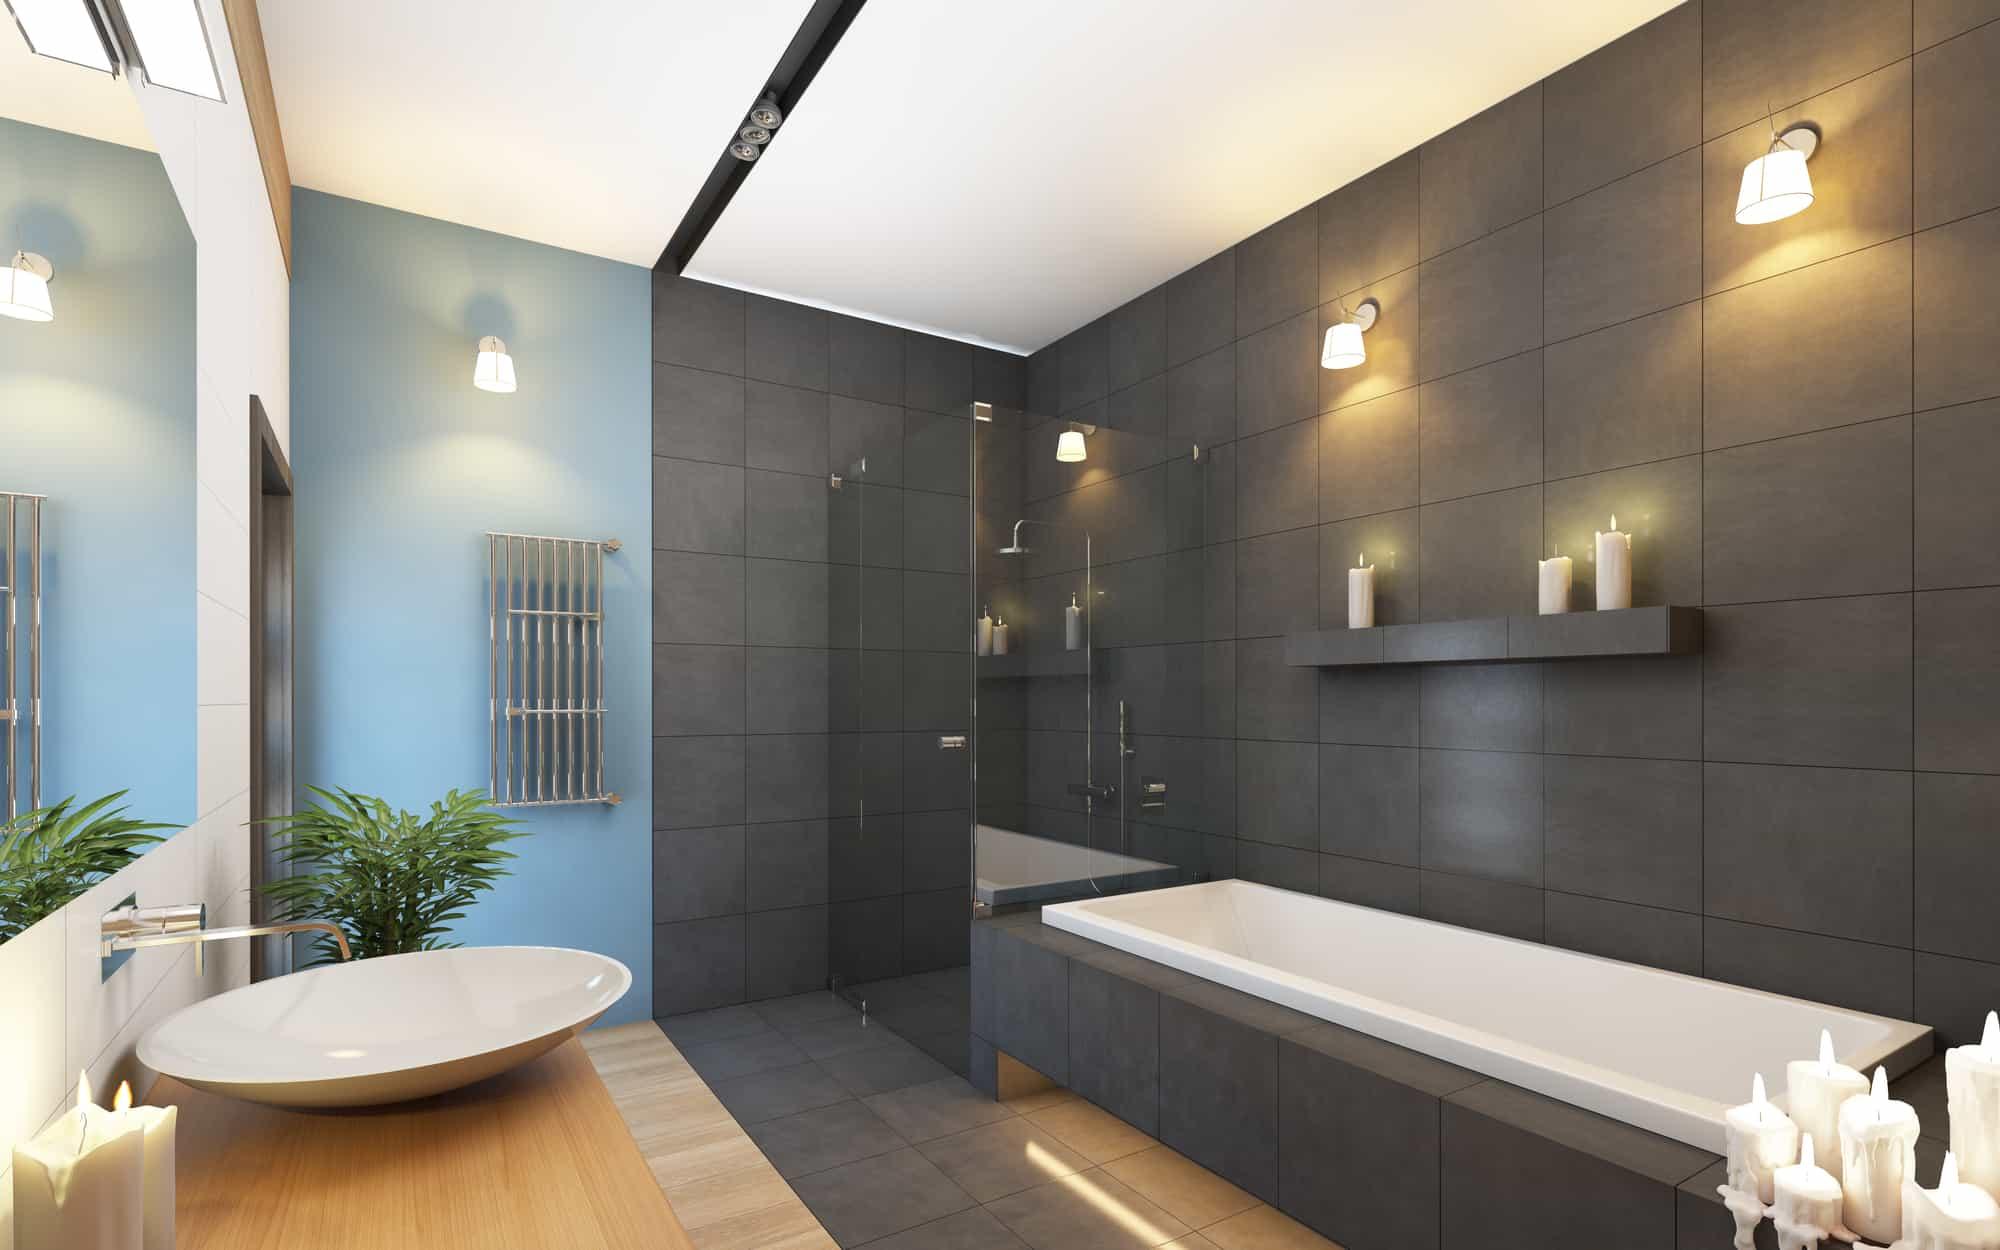 Quality bathroom products